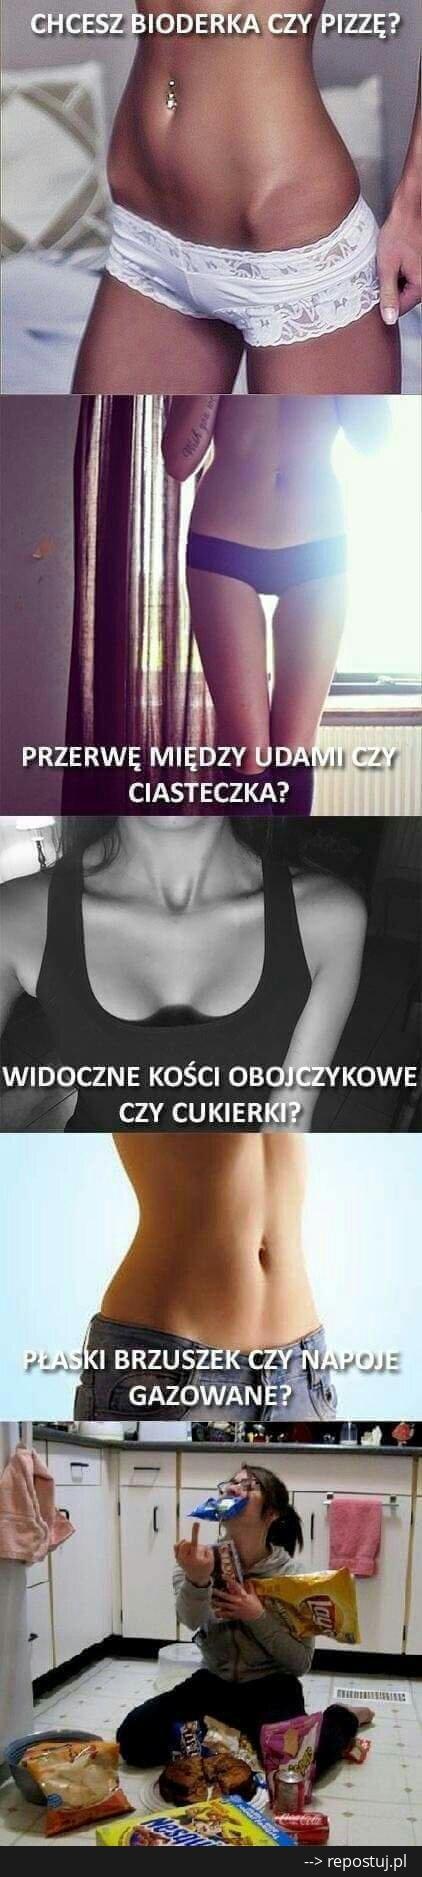 XD ...